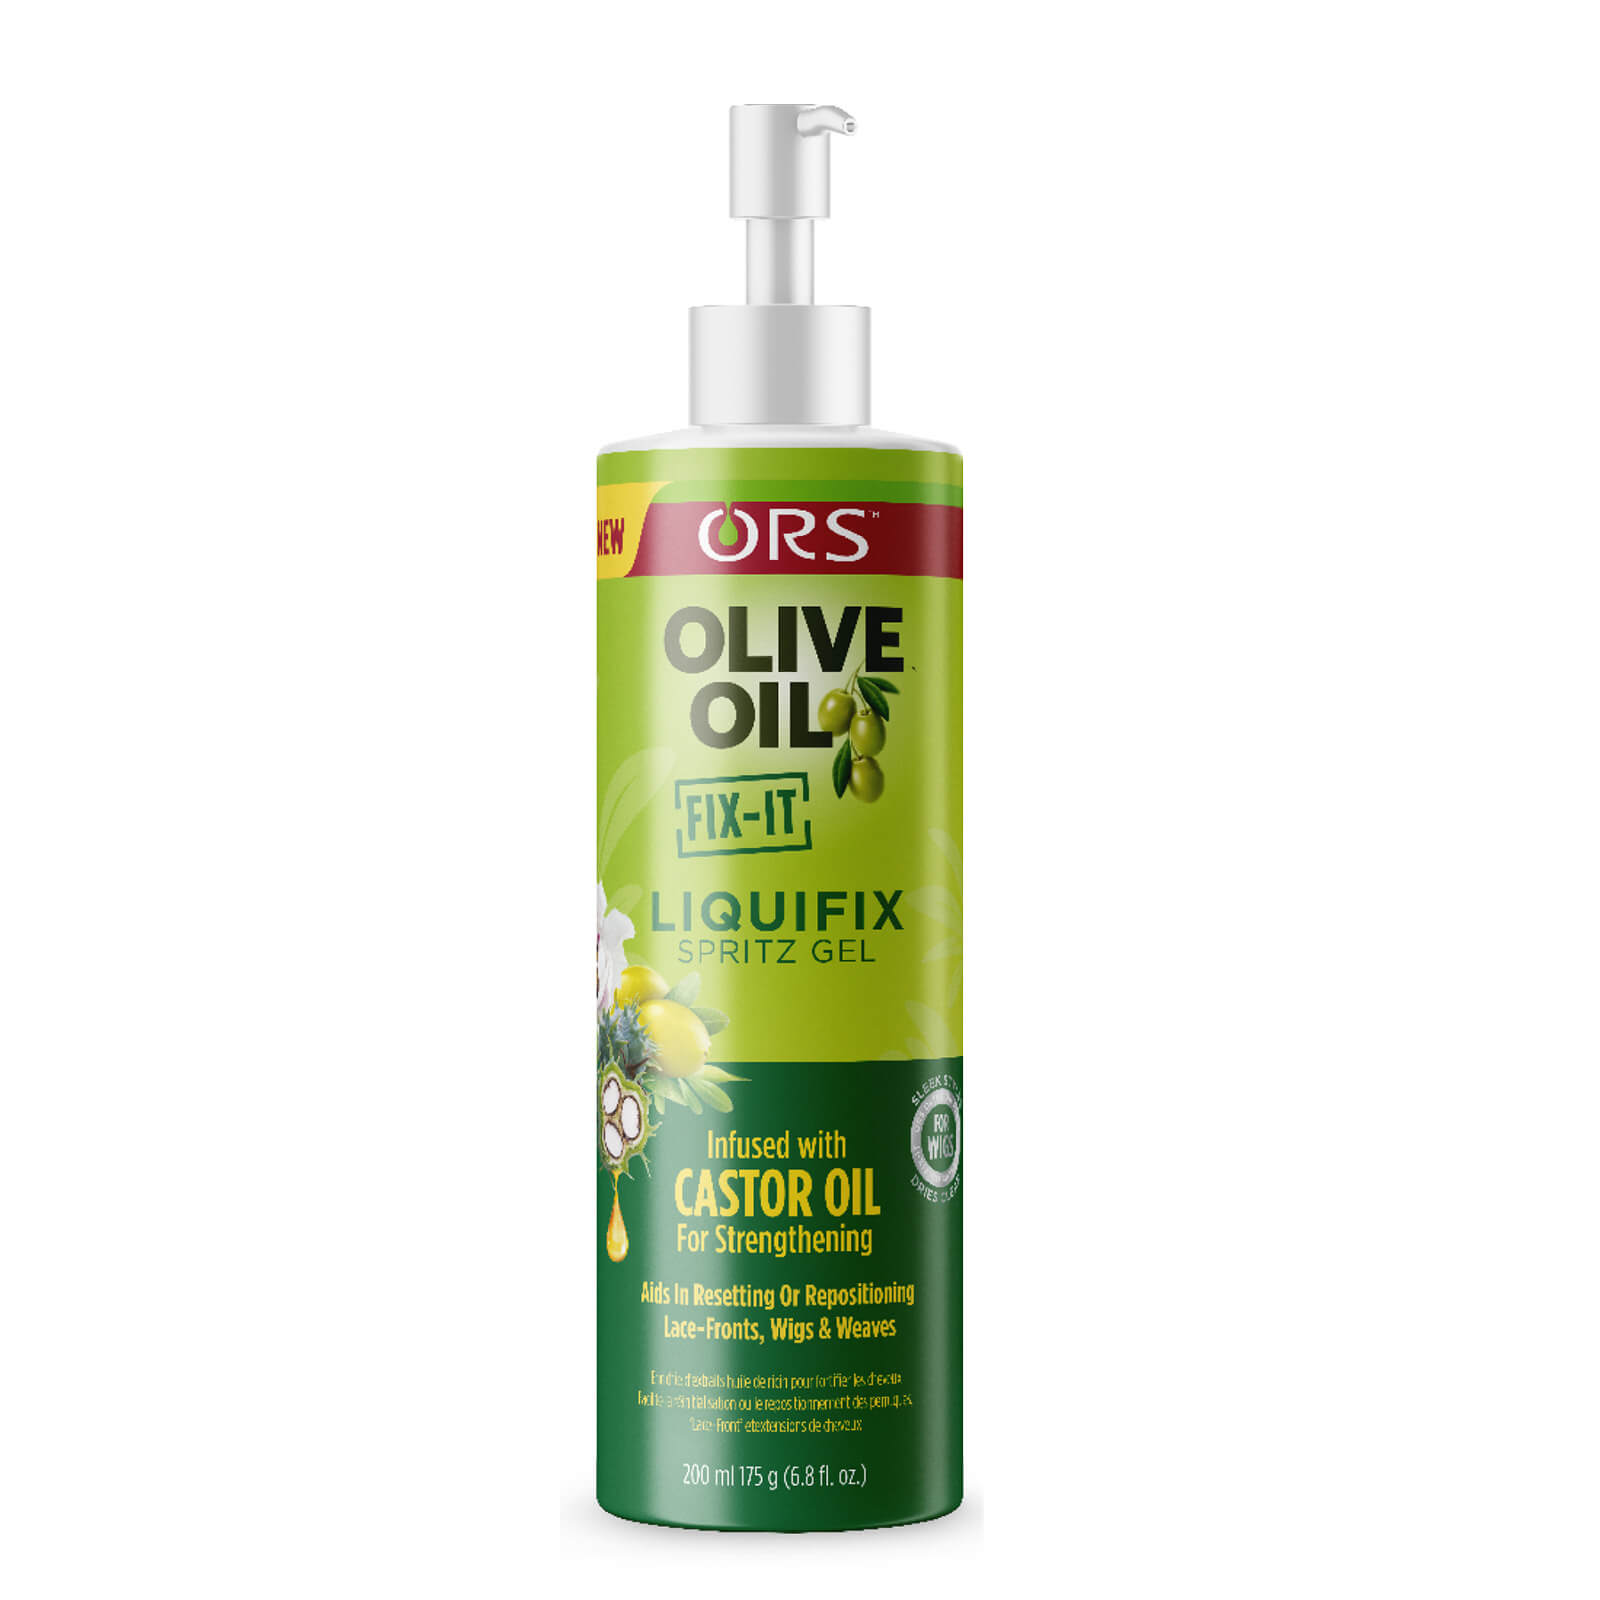 Купить ORS Olive Oil FIX IT Liquifix Spritz Gel Infused With Castor Oil 200ml